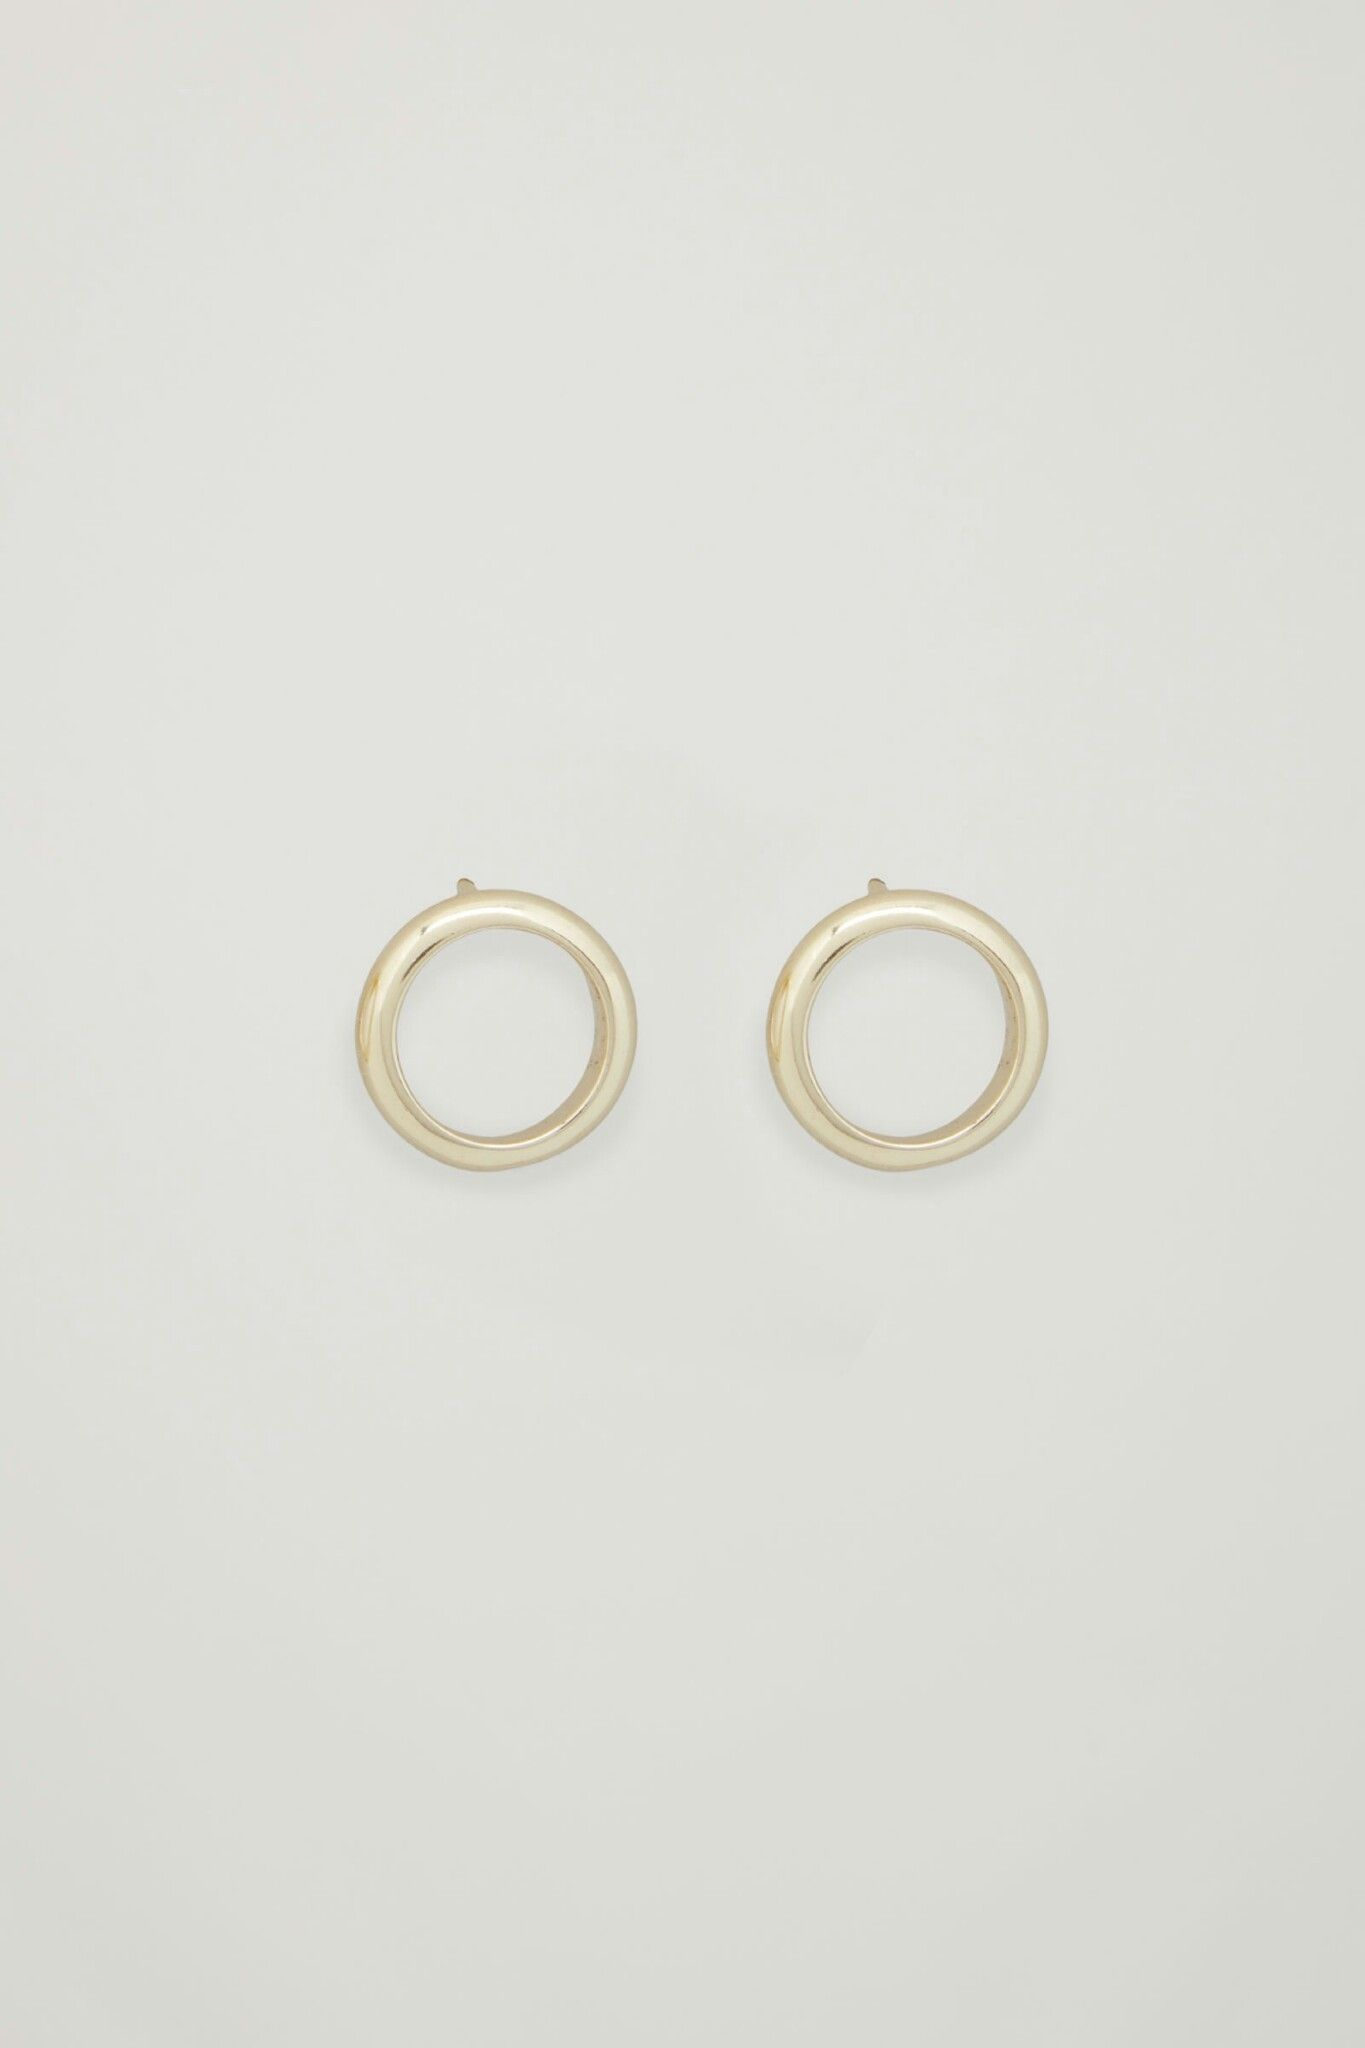 Pin By Daria Prokoshina On Cos Accessories Wishlist Earrings